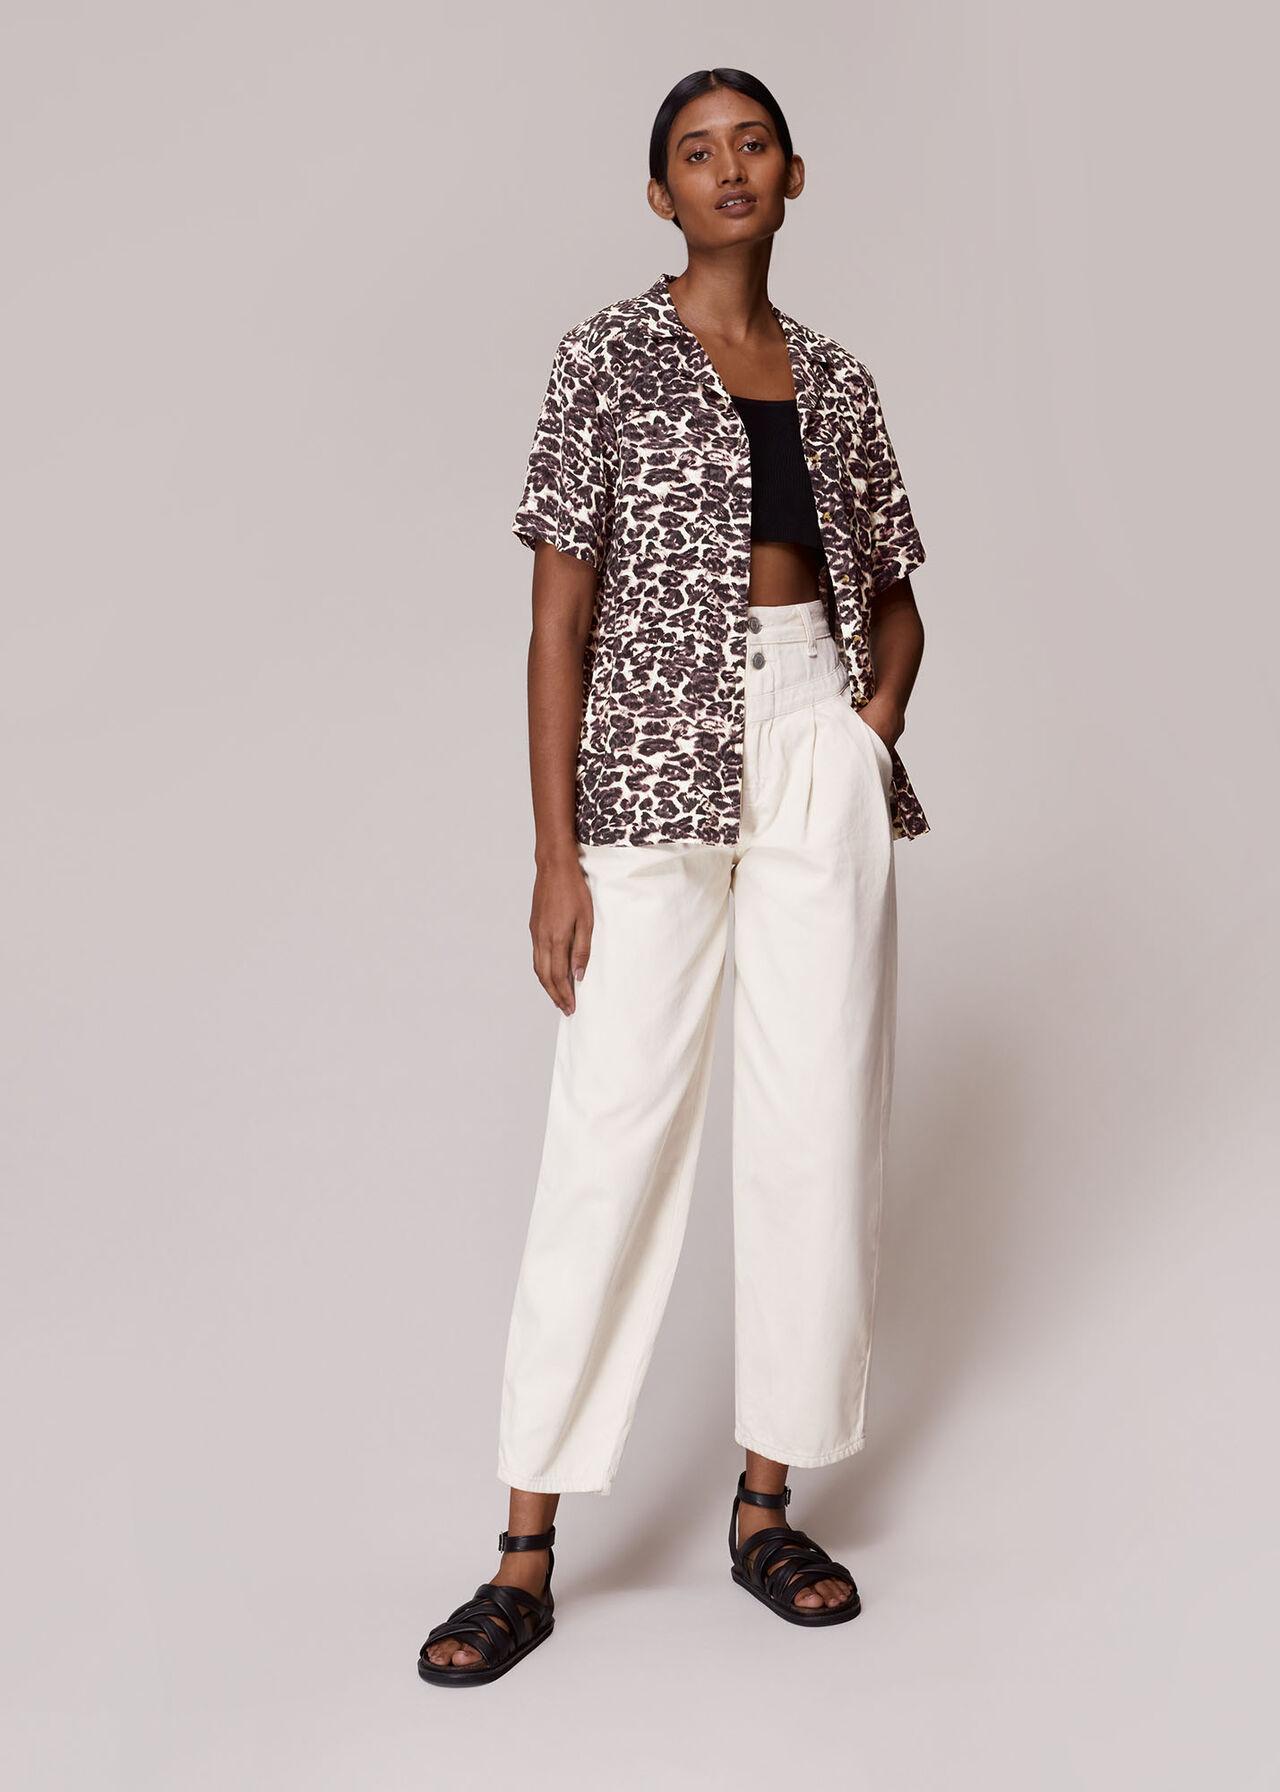 Clouded Leopard Print Shirt